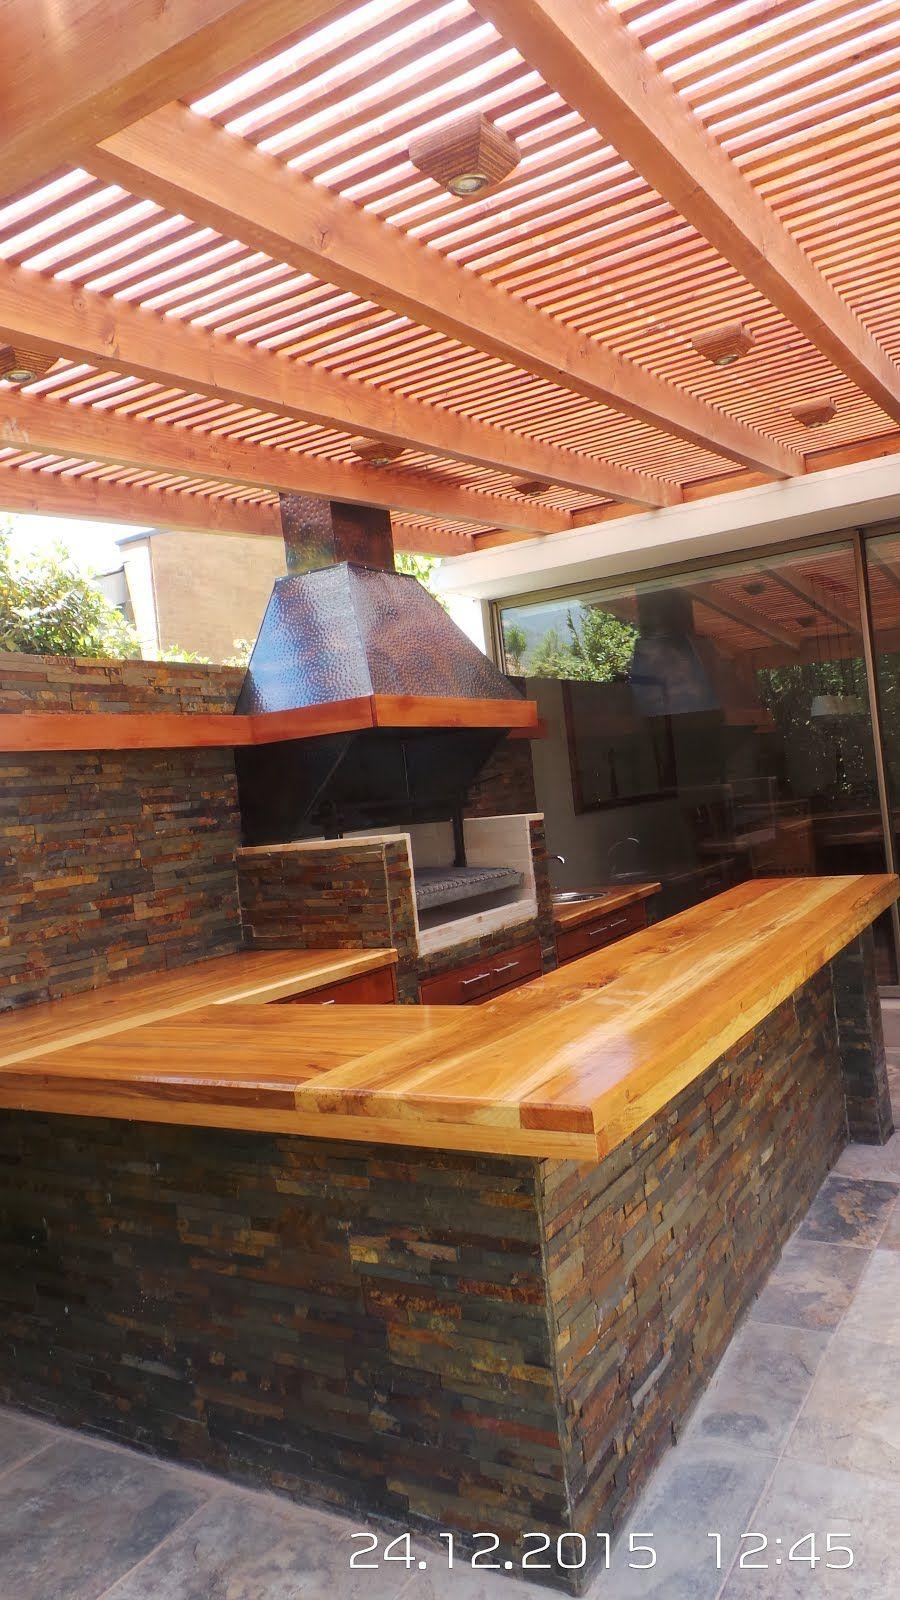 barbecue smoker grill contemporary firepits kingbird design